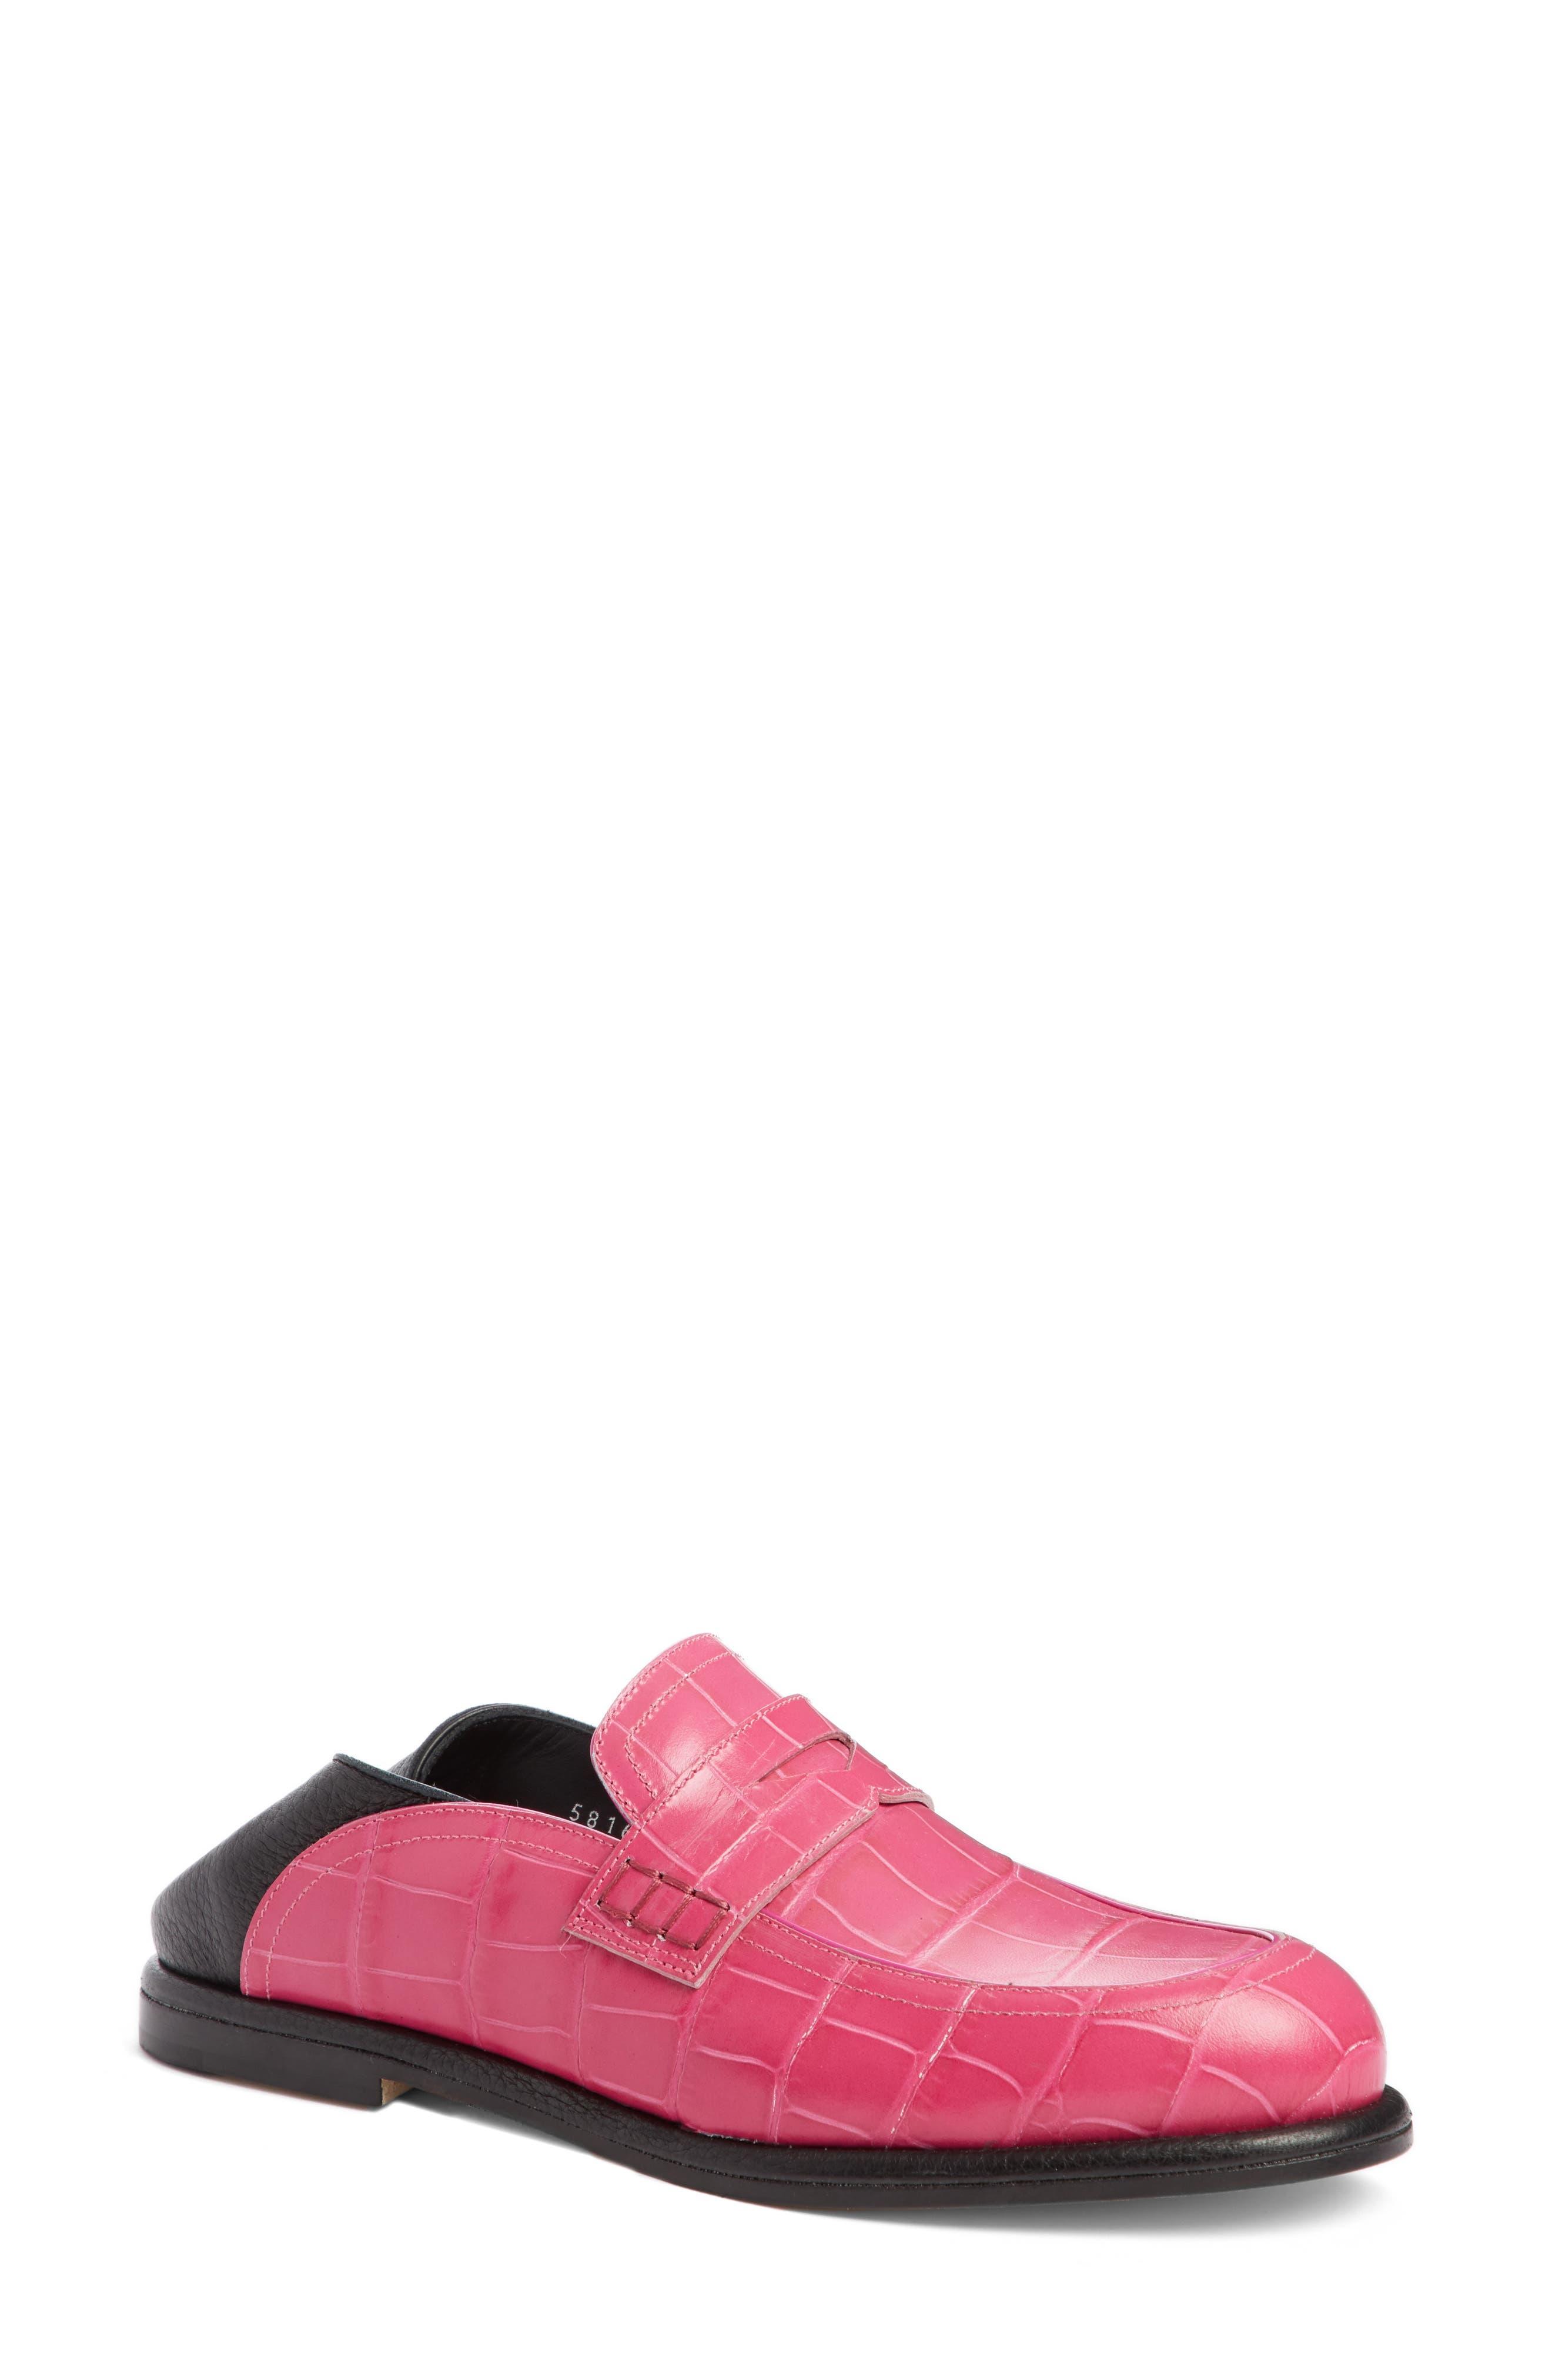 Loewe Convertible Loafer (Women)